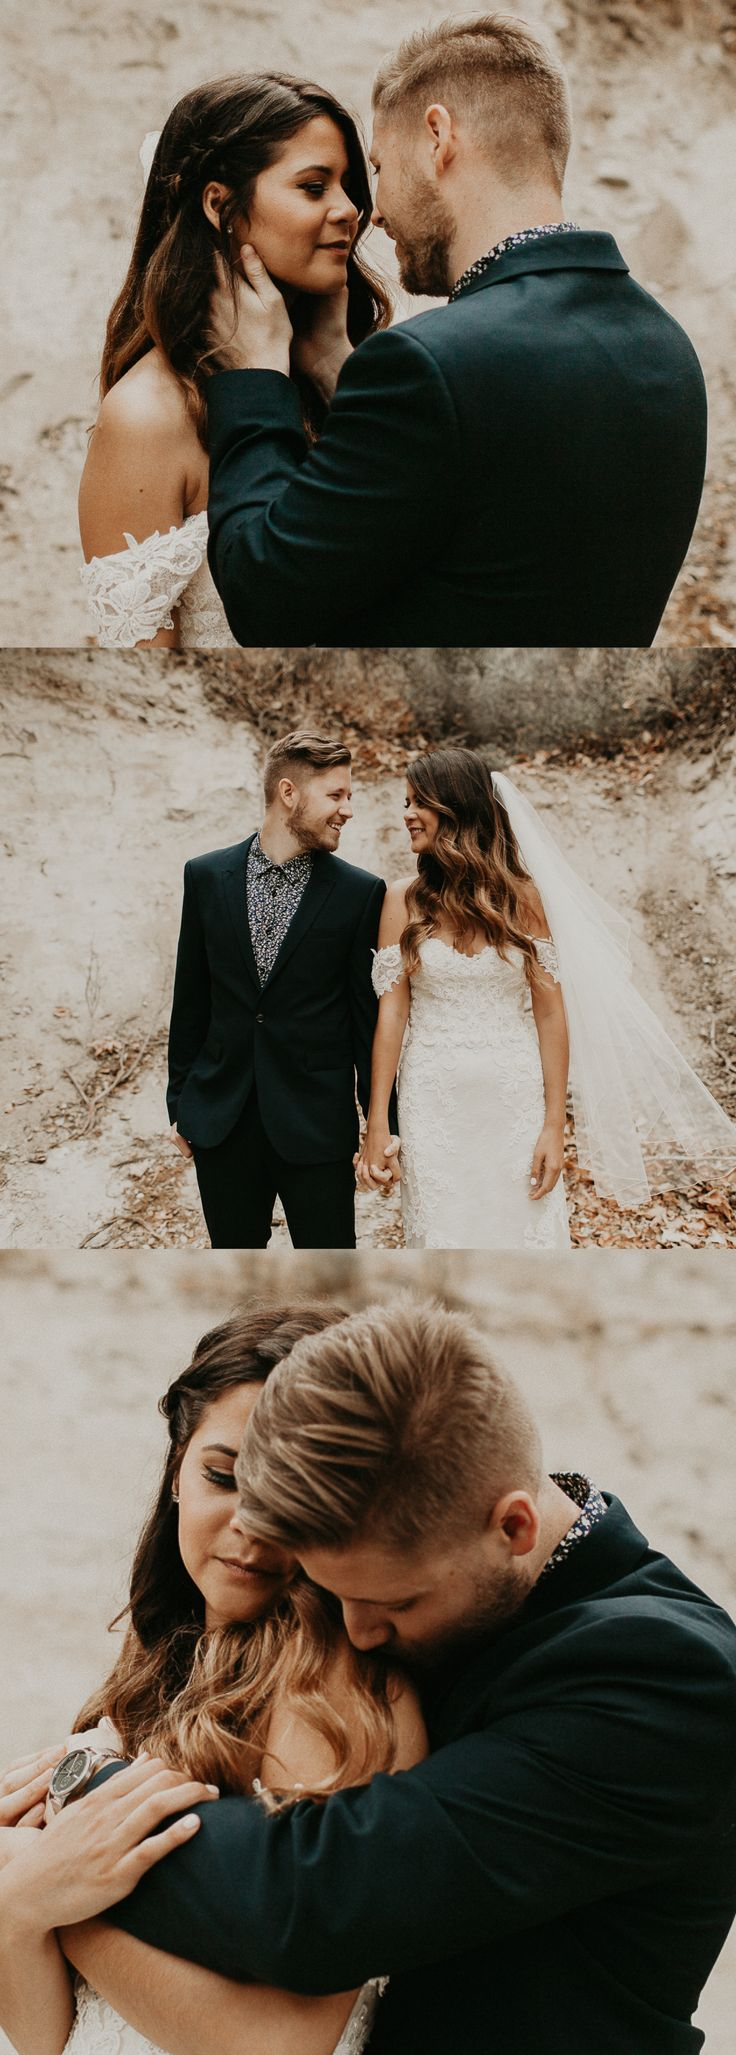 best boho elopement images on pinterest photography wedding